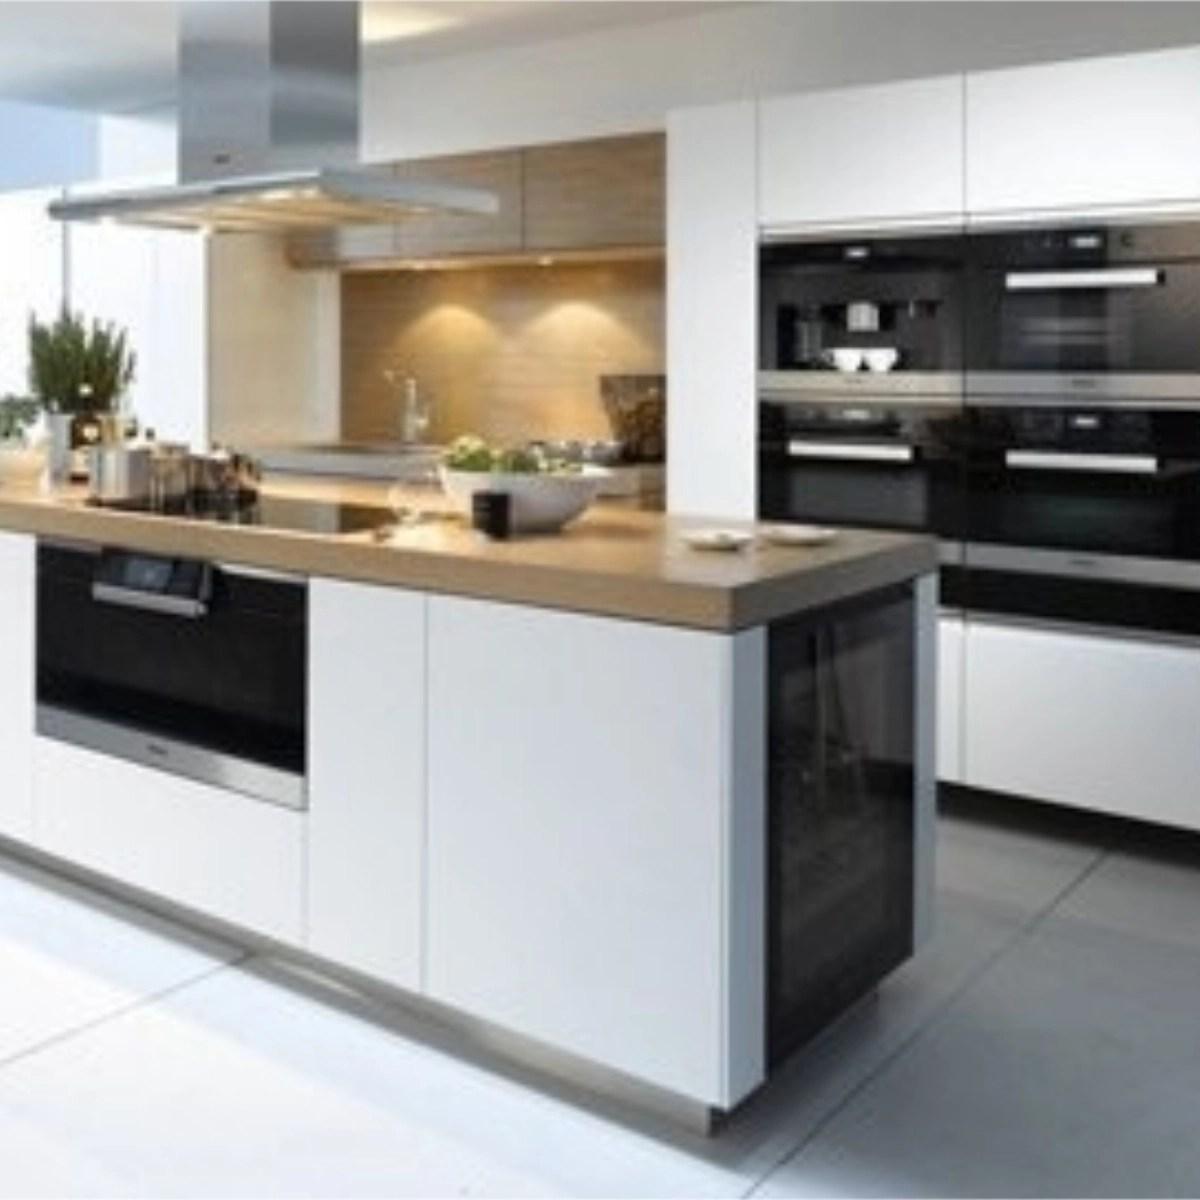 Built in Appliances Guide Trowbridge Westbury Warminster